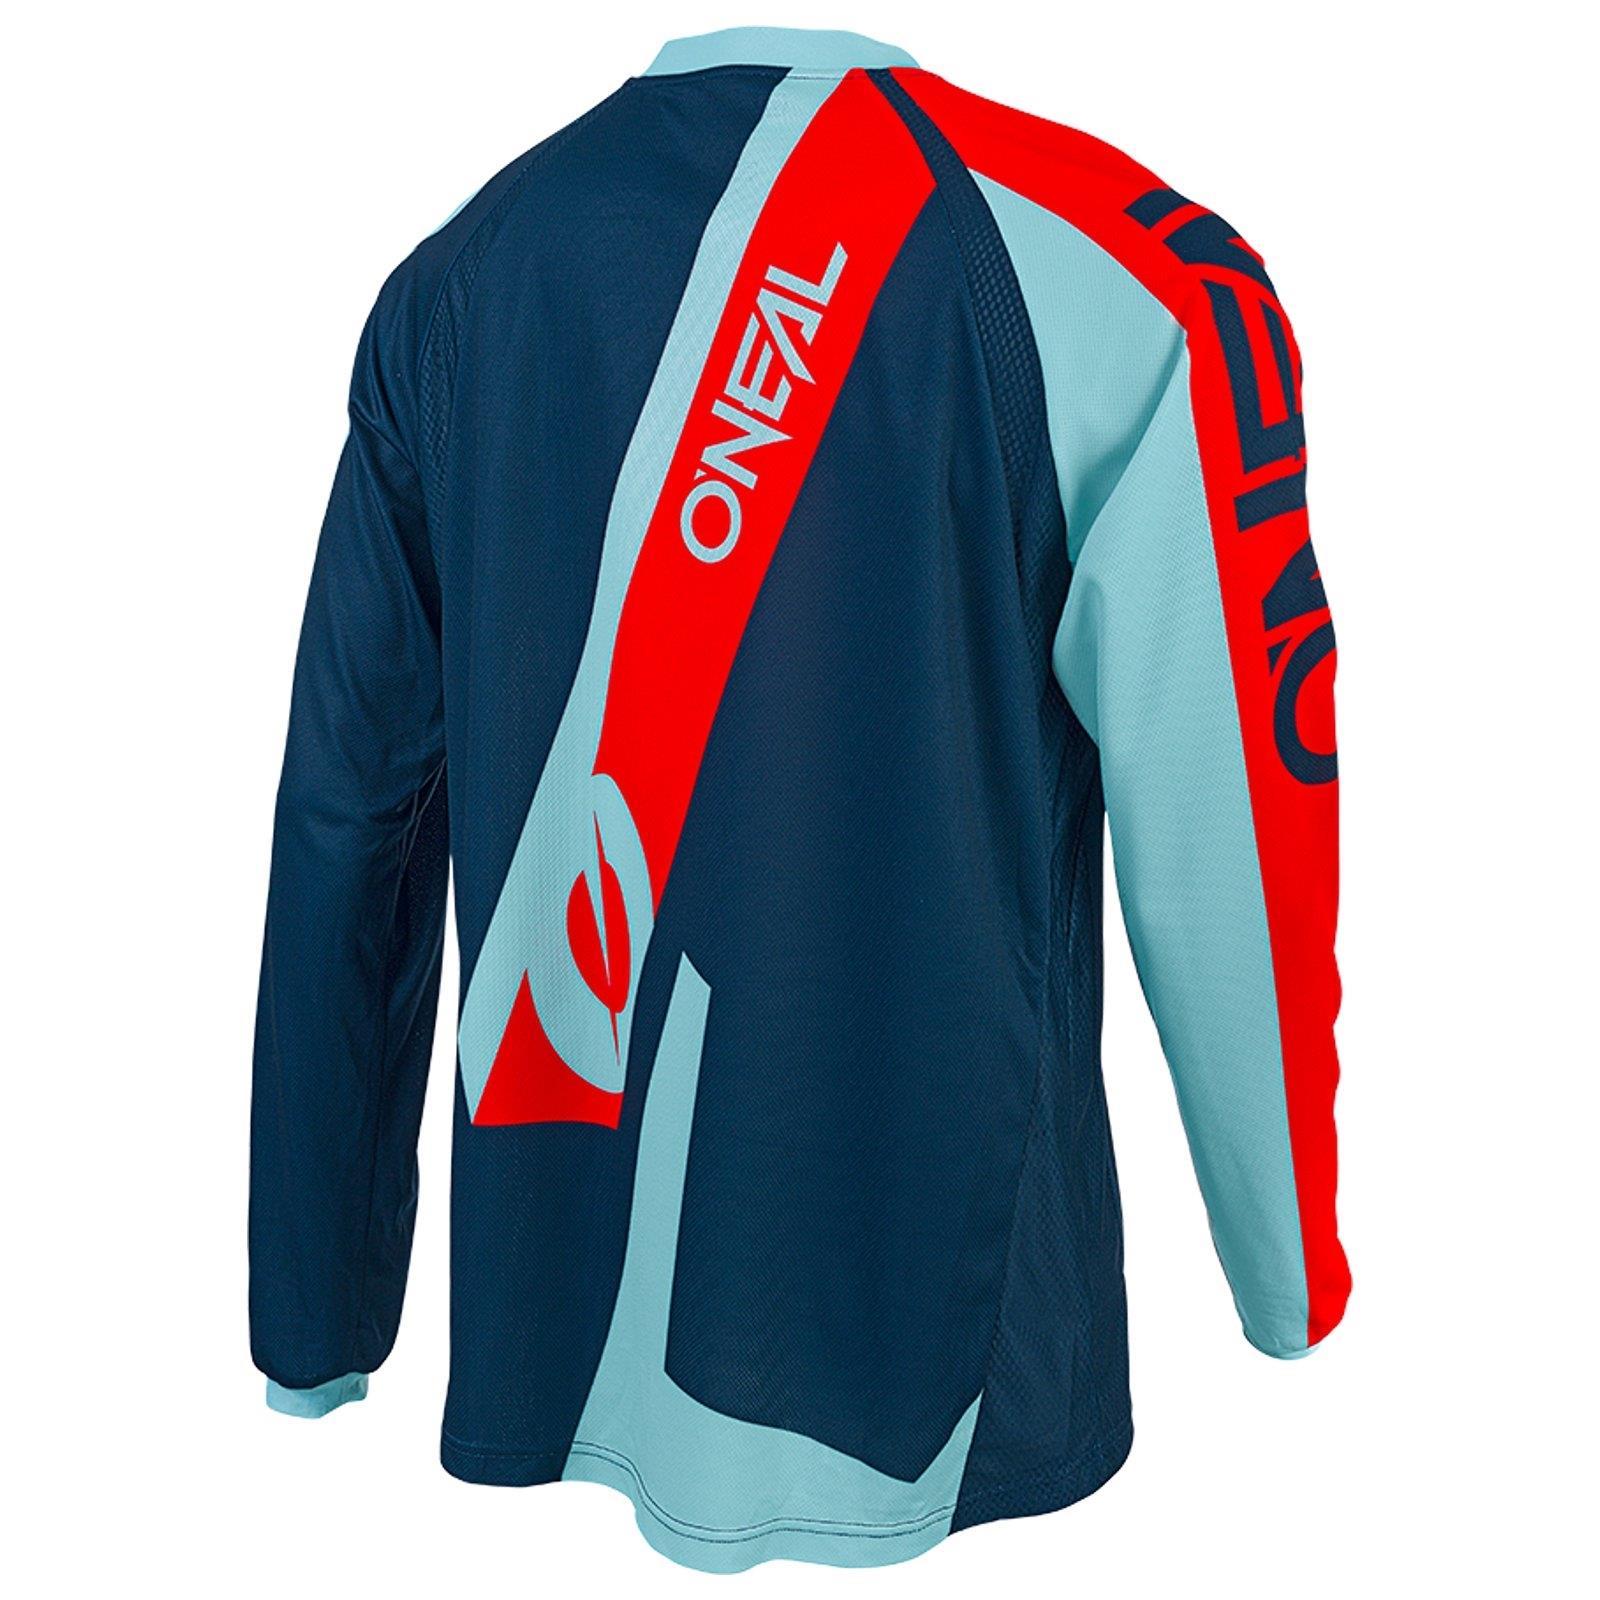 O-039-Neal-elemento-Mayhem-JERSEY-Racewear-Motocross-Maglia-MX-DH-FR-MTB-MOUNTAIN-BIKE miniatura 68